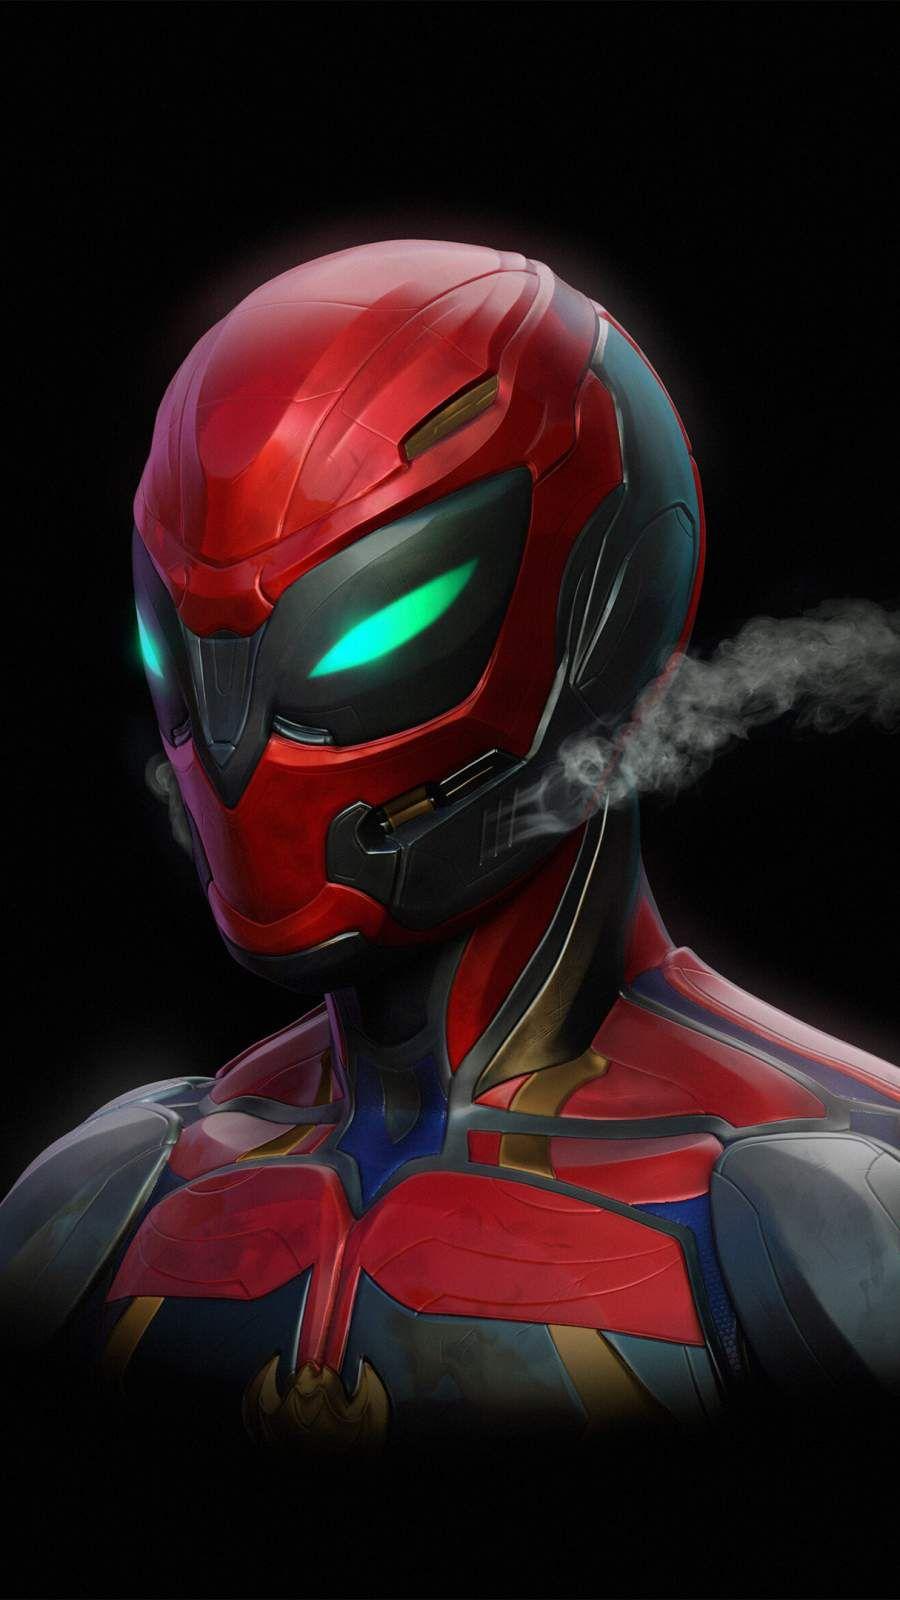 Spiderman Future Suit IPhone Wallpaper nel 2020